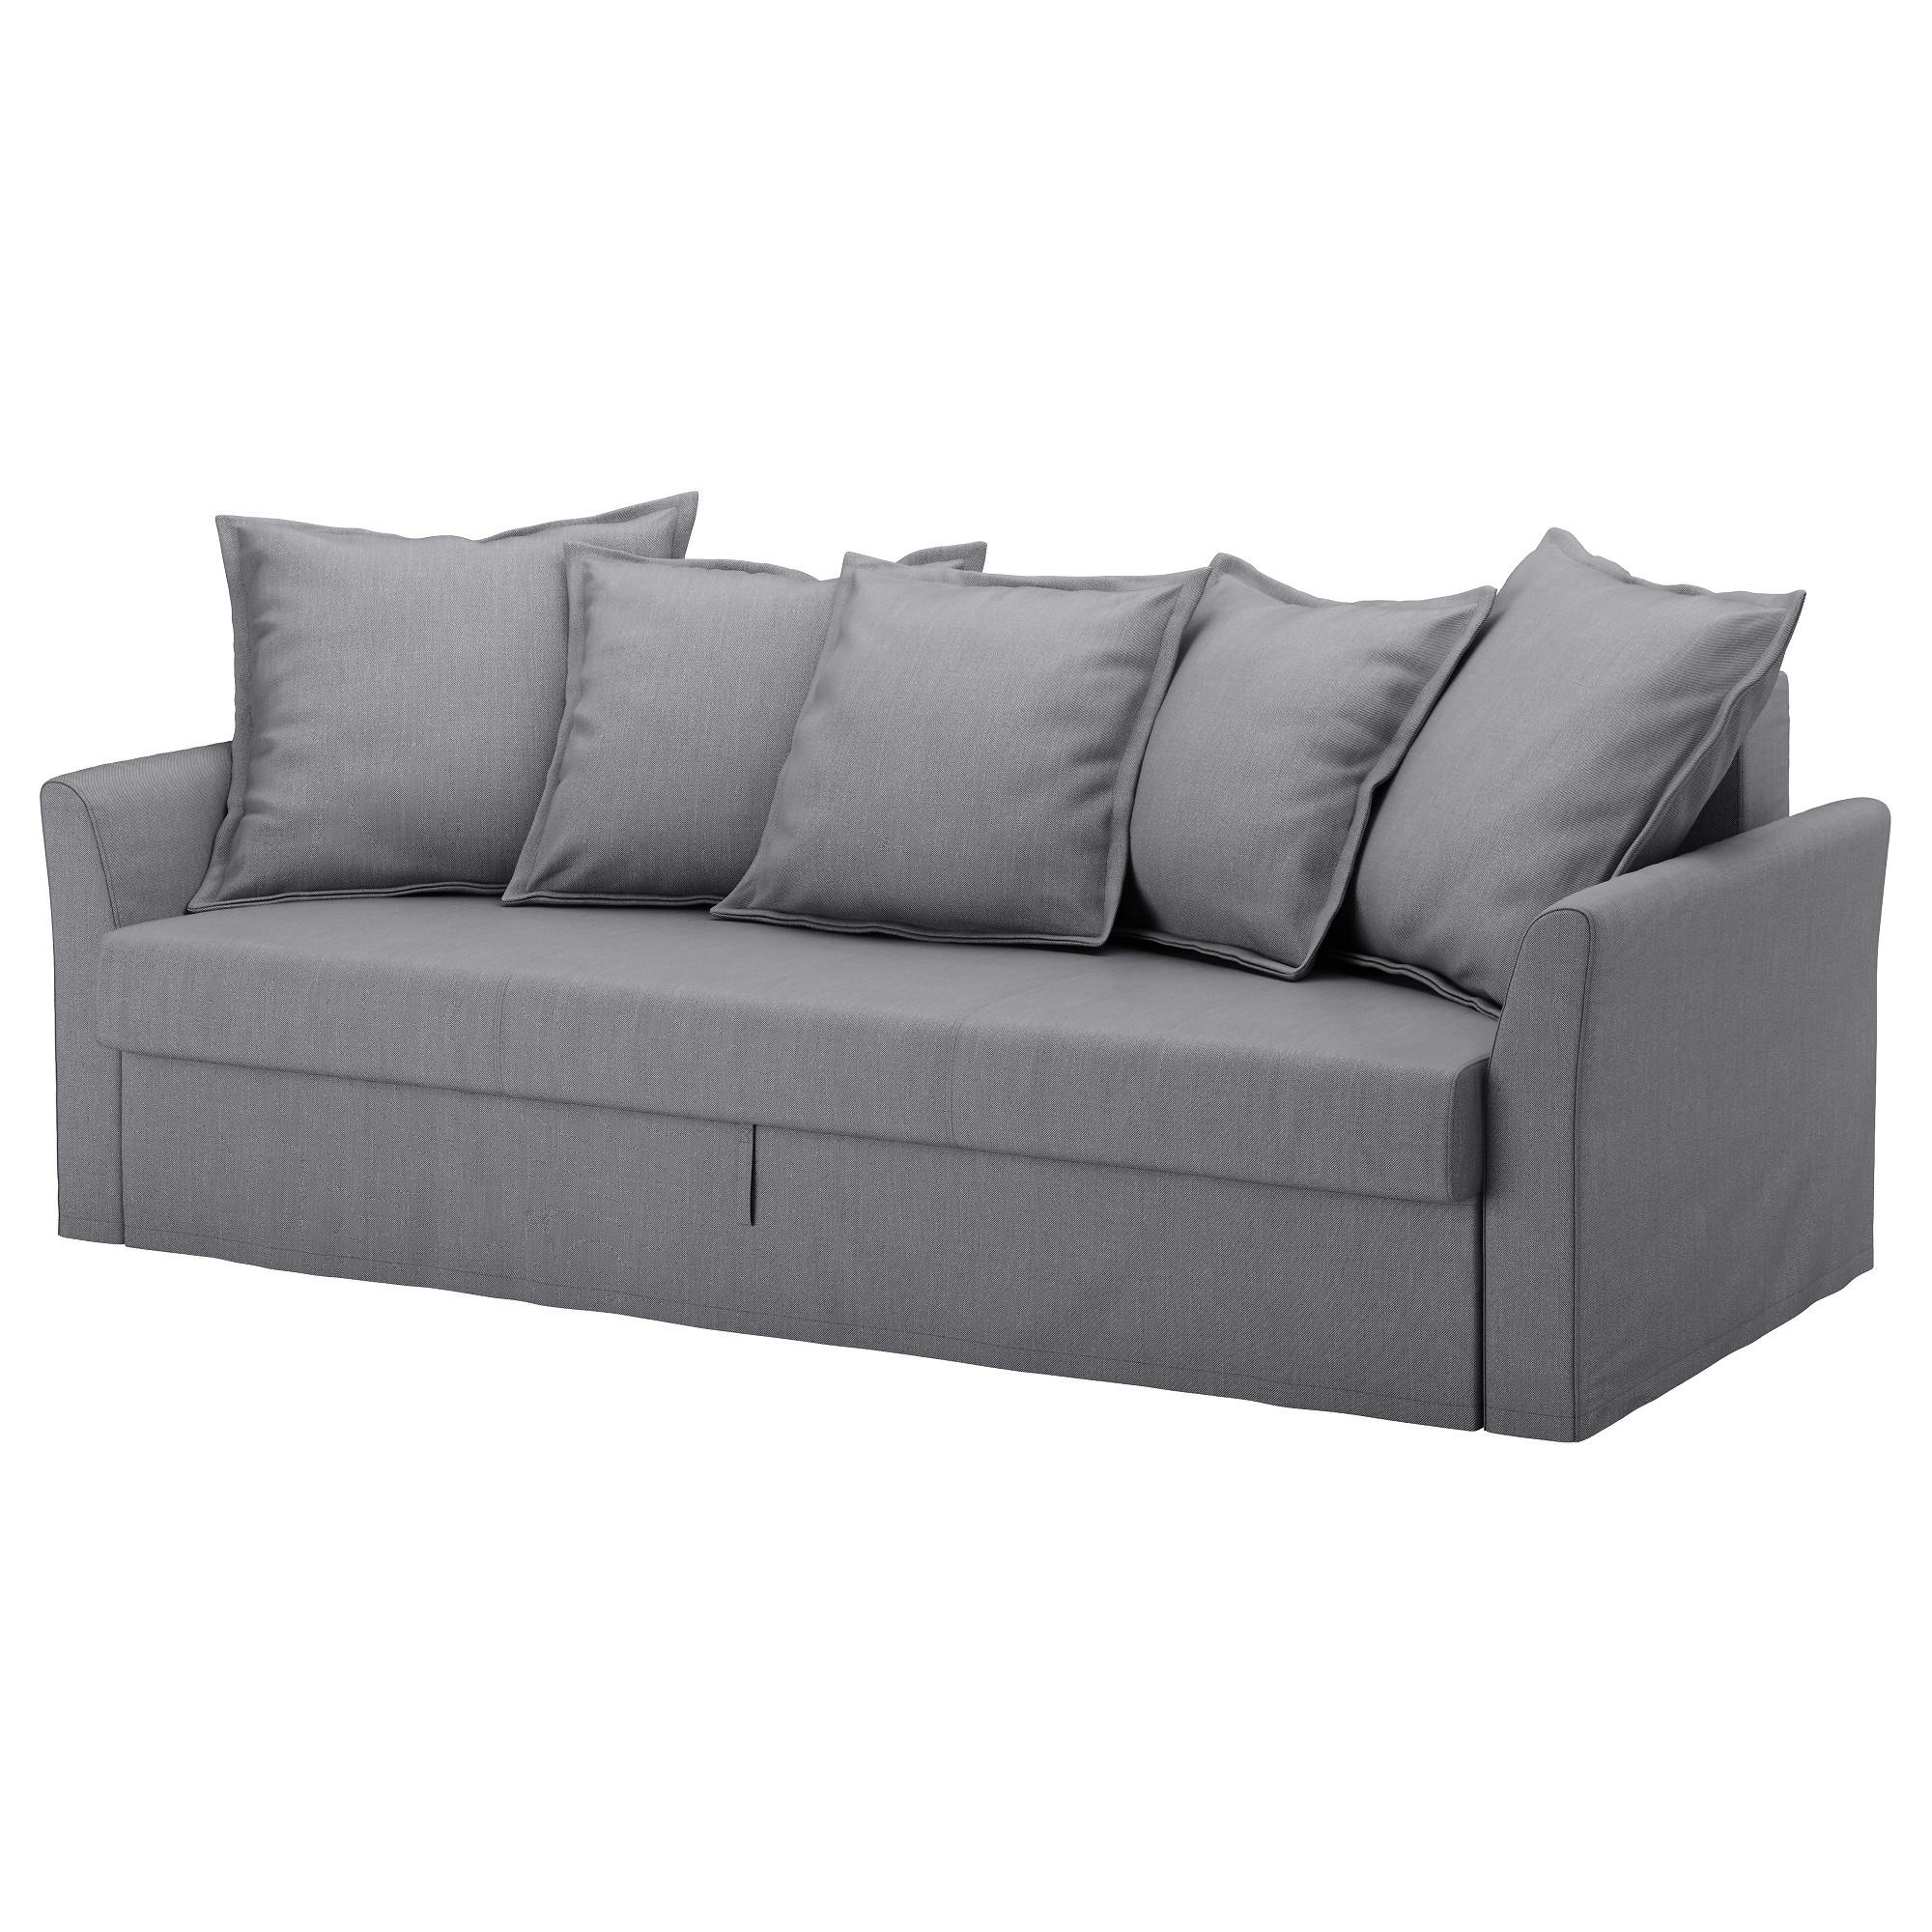 Sofas Center : Fearsome Loveseat Sleeper Sofa Ikea Picture Design In Sleeper Sofas Ikea (Image 17 of 20)